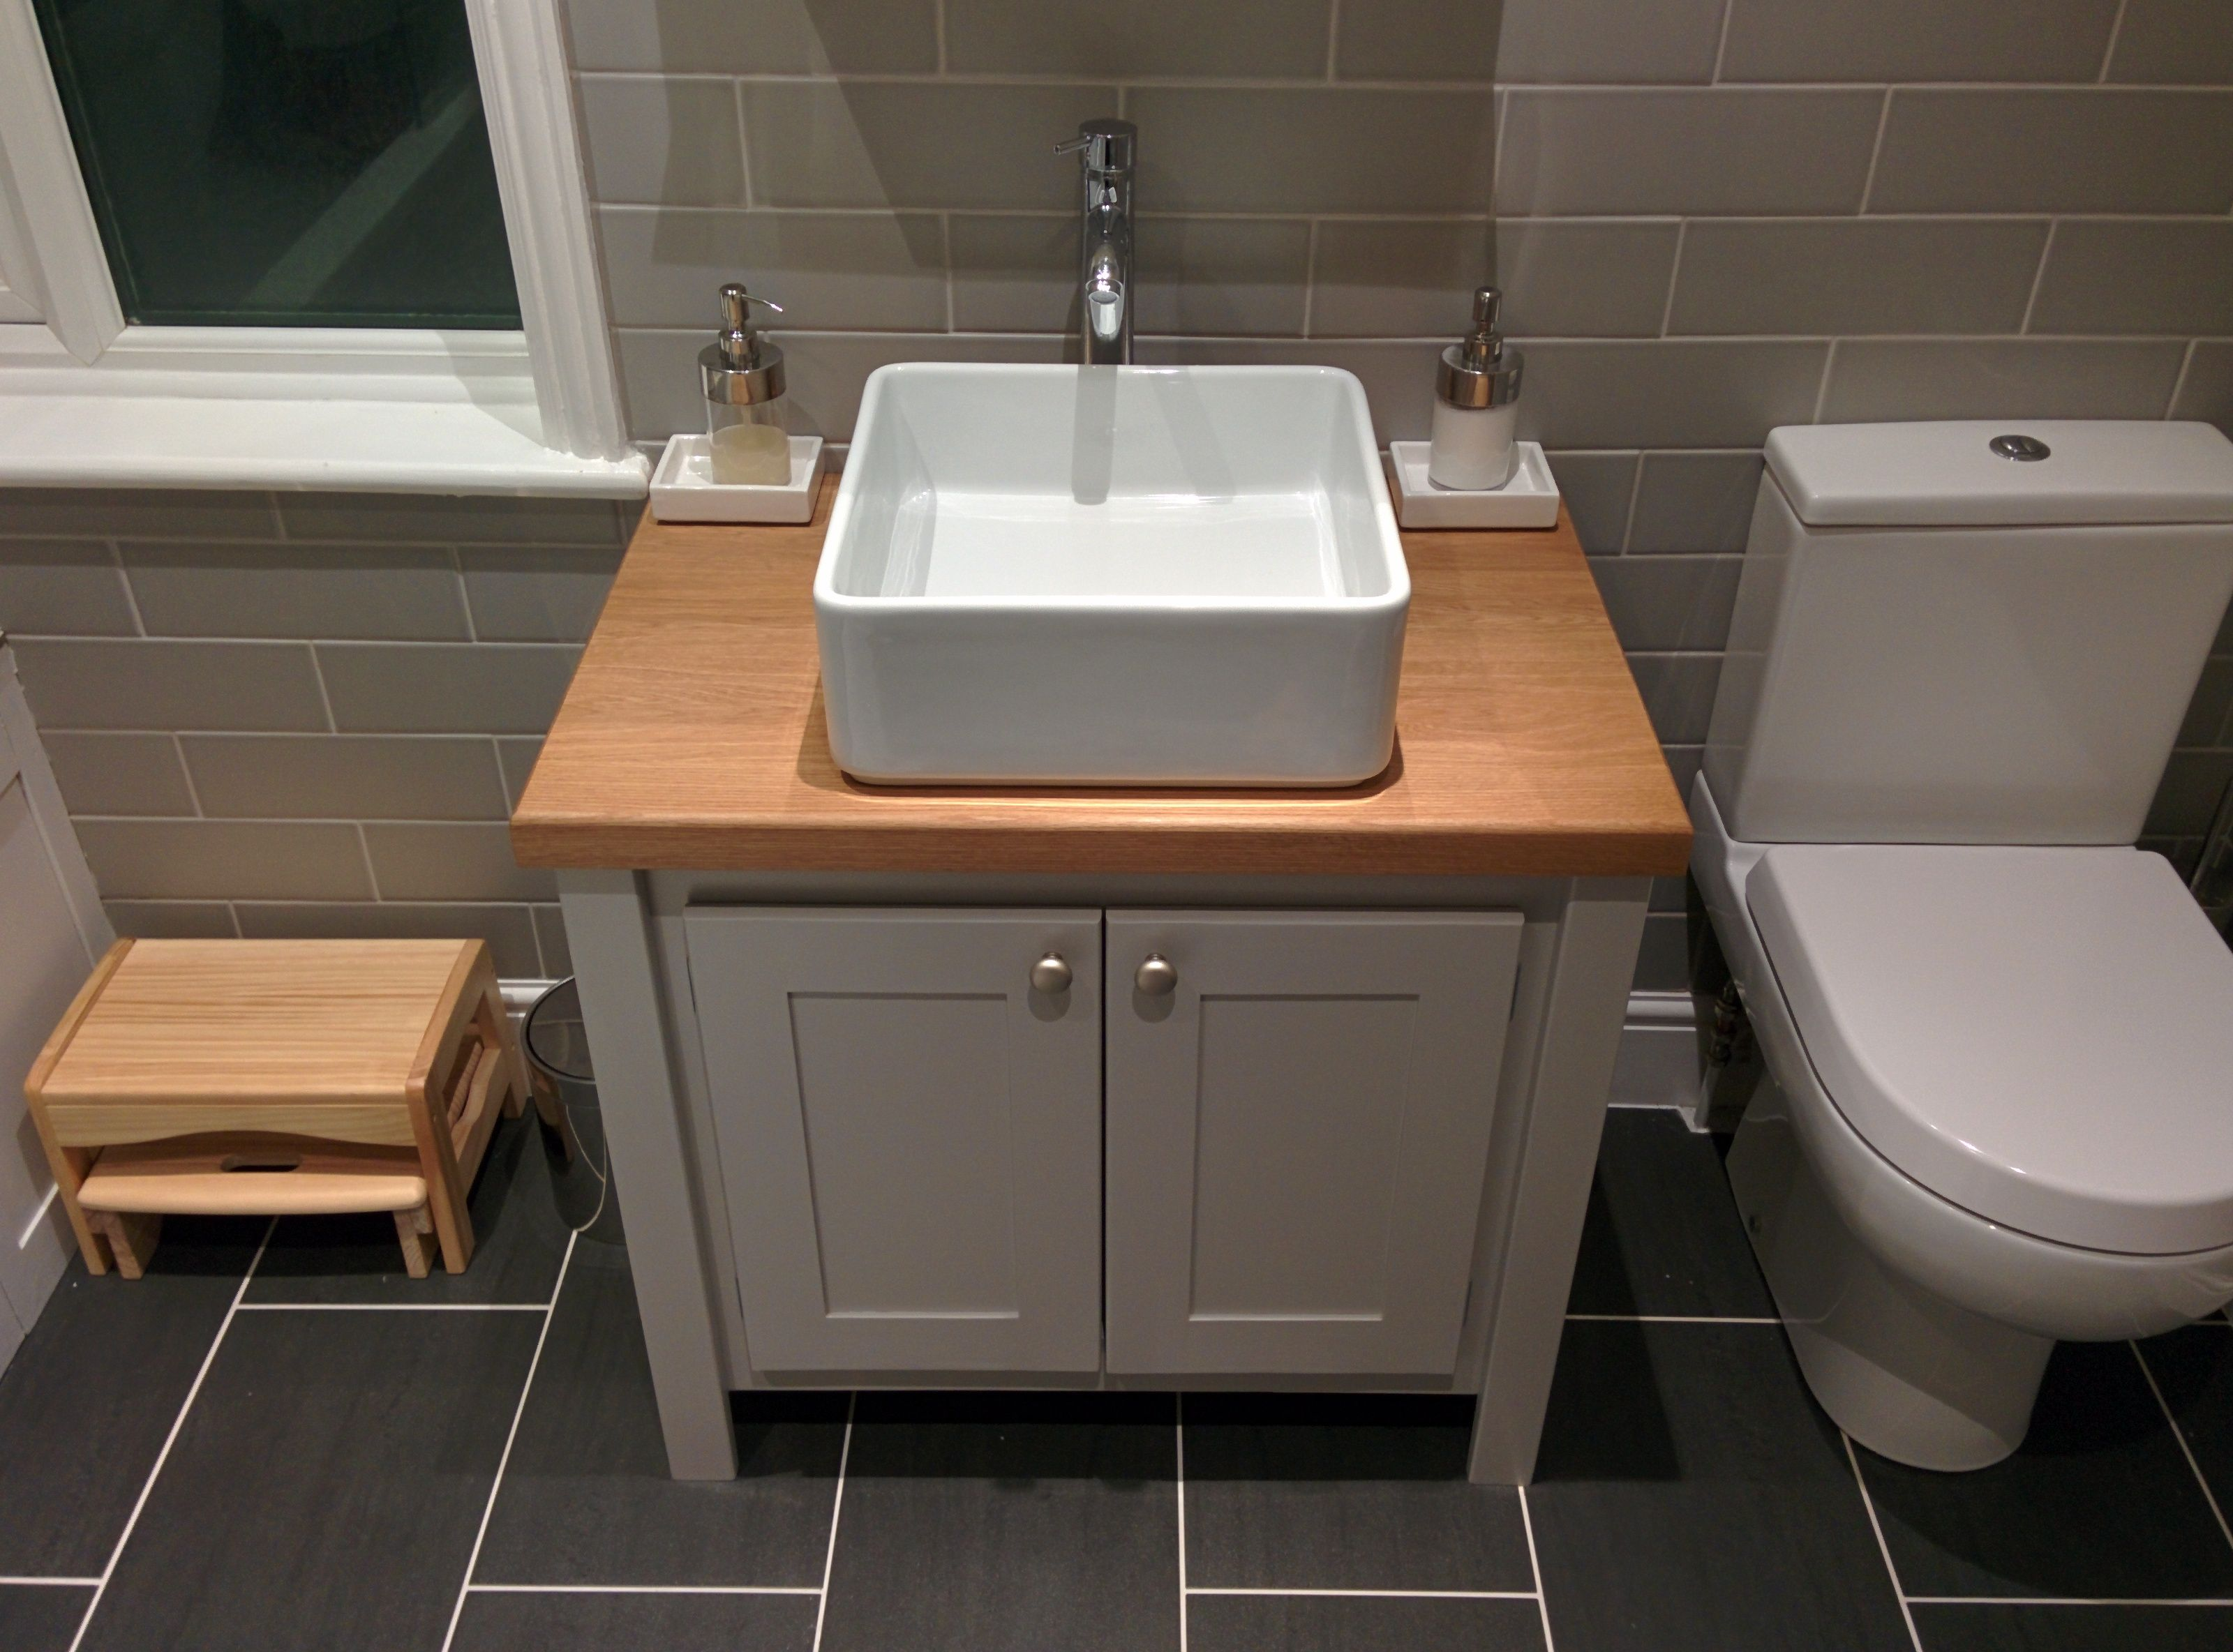 Vanity Unit Bathroom Grey manor house grey with a solid oak top vanity unit. all our vanity